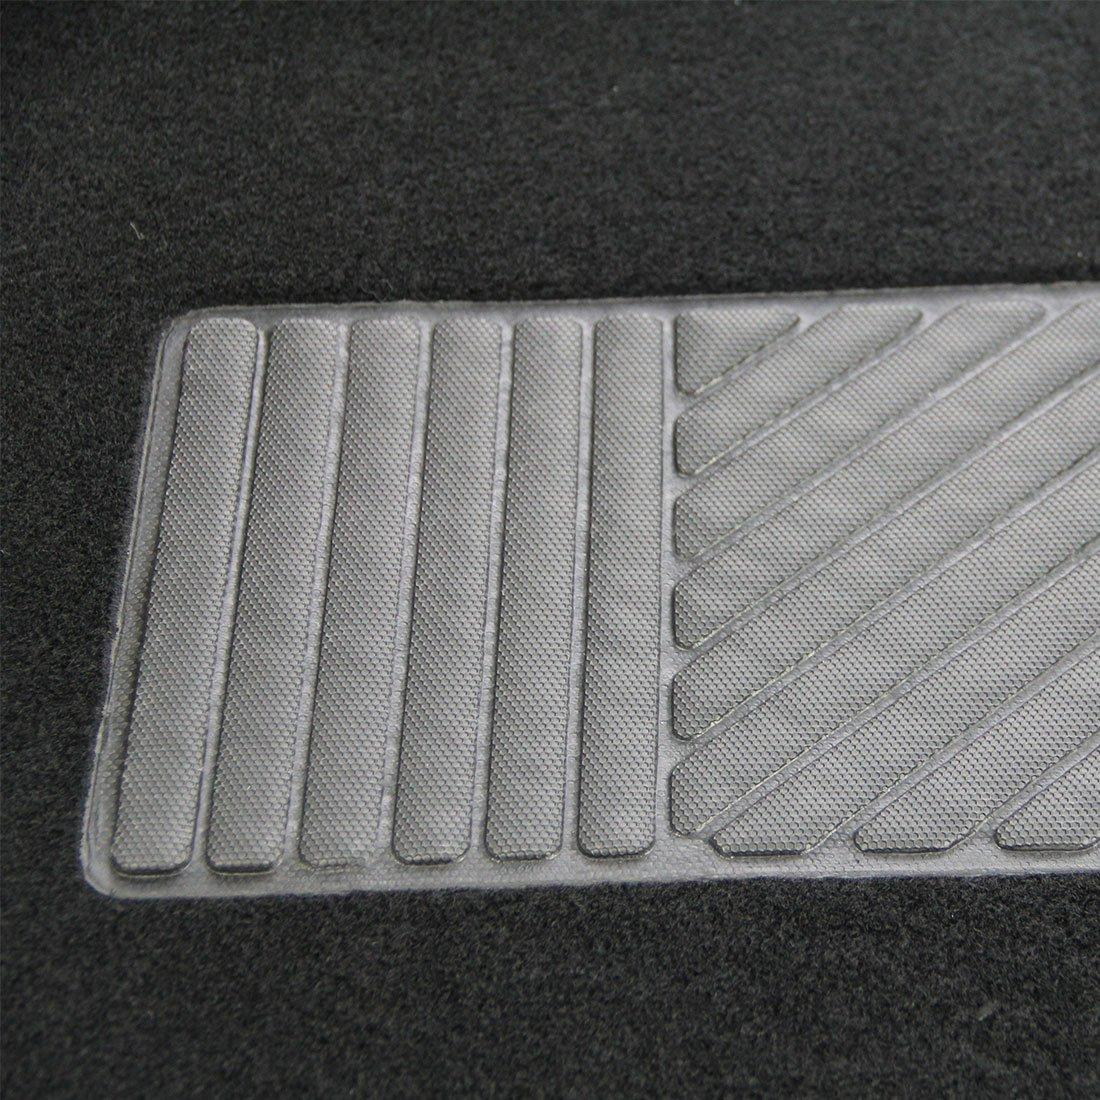 Copap Car Floor Mats Carpet Full Set Floor Mats for Cars SUV Trucks Include 4pcs Front Rear Car Carpet Floor Mats Black with Gray Flame Pattern Automart IAFM-6038-B